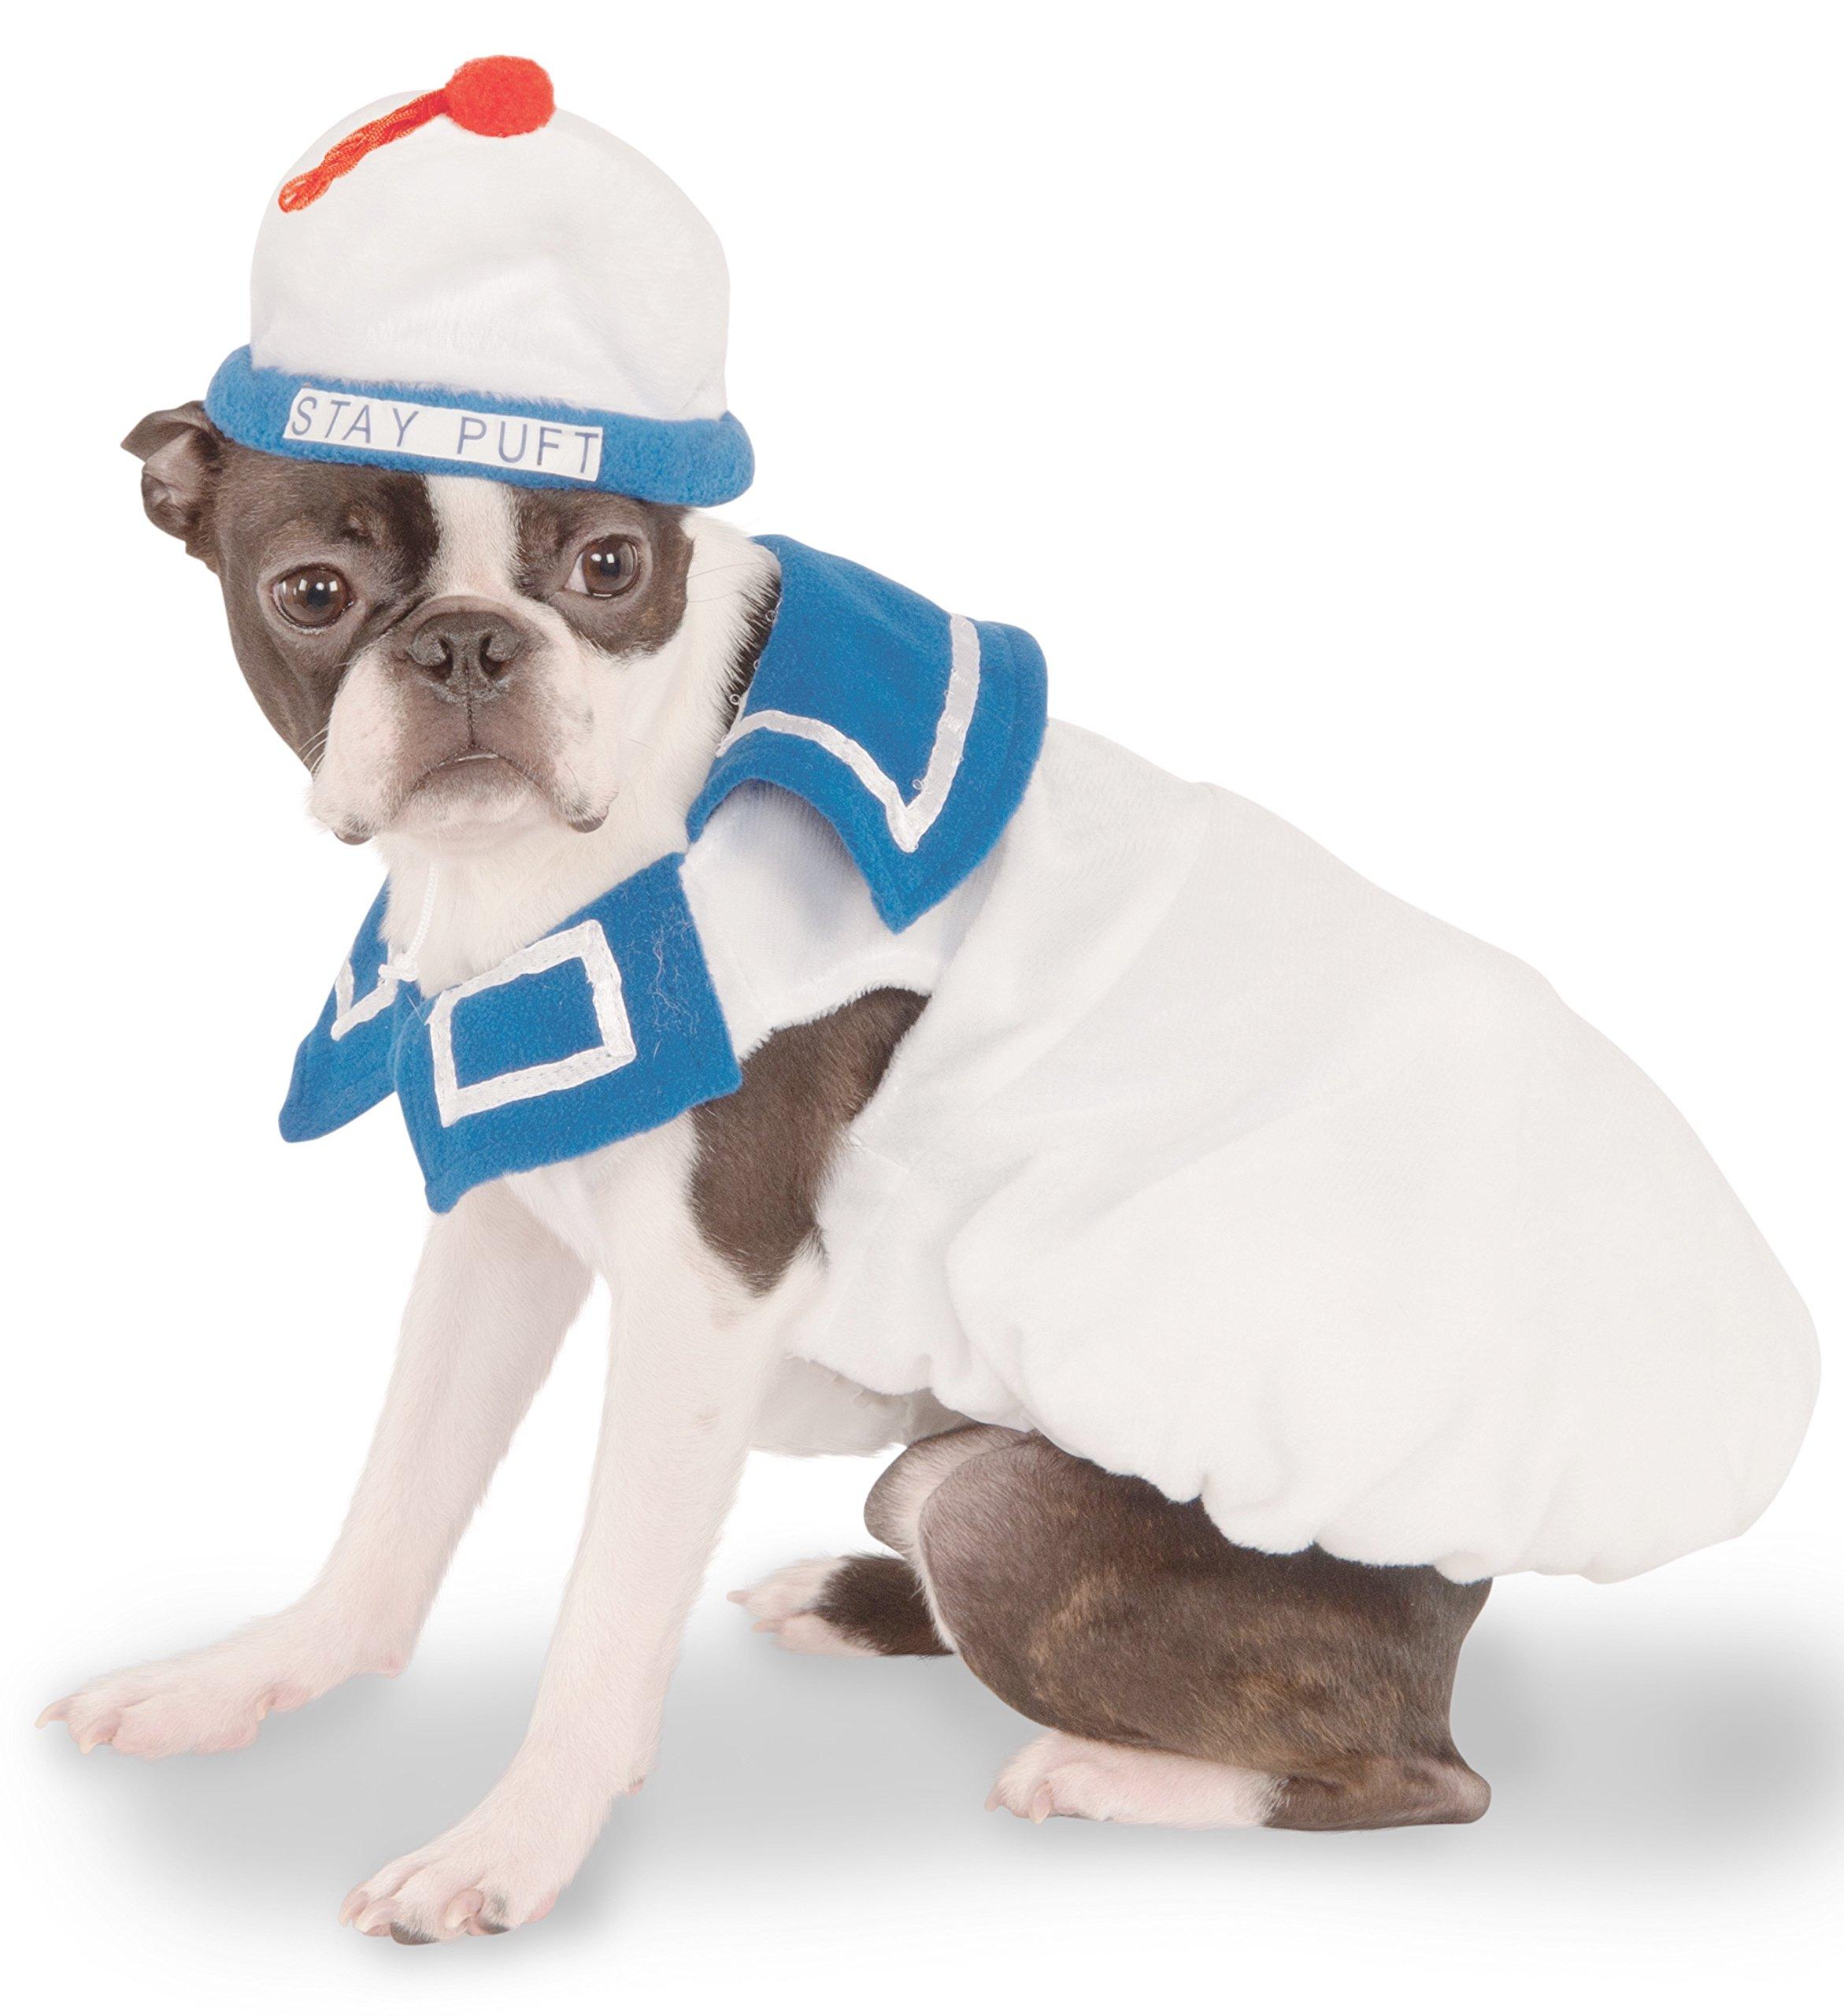 Ghostbusters Movie Pet Costume, Medium, Stay-Puft Marshmallow Man